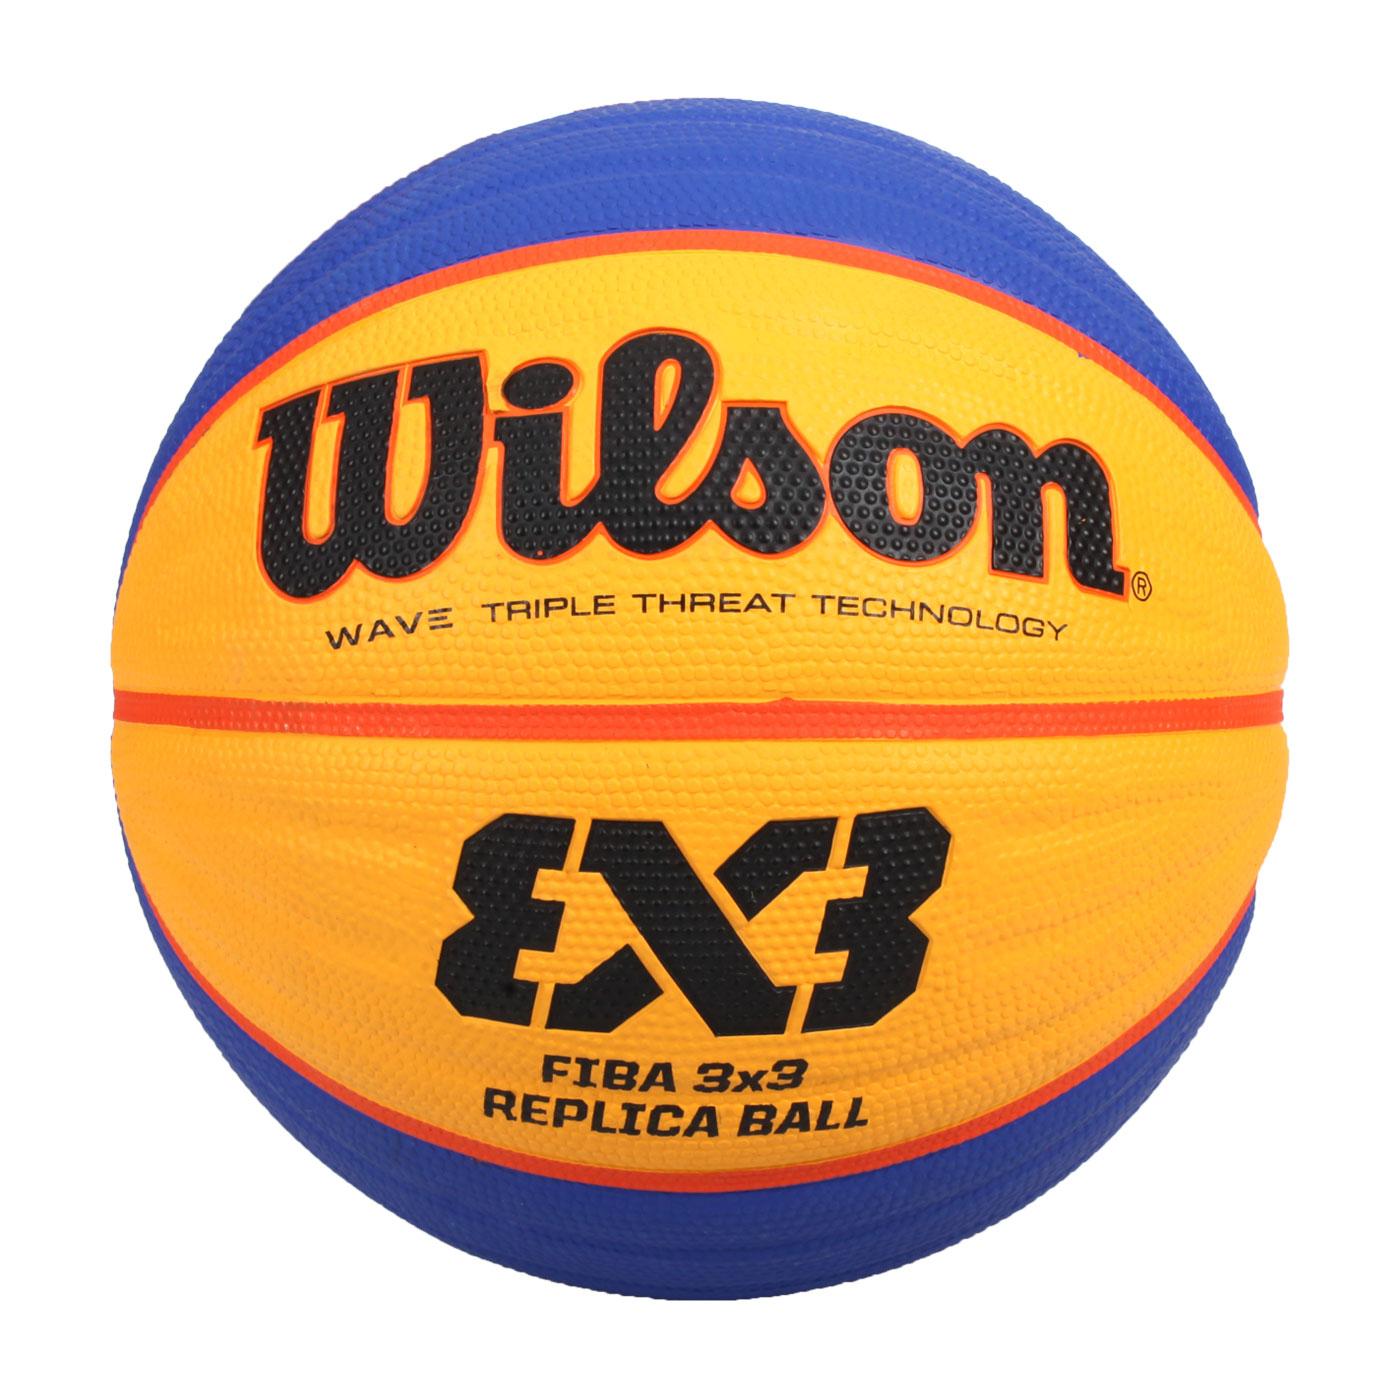 WILSON FIBA 3x3國際賽指定用球橡膠籃球 WTB1033XB - 黃藍黑